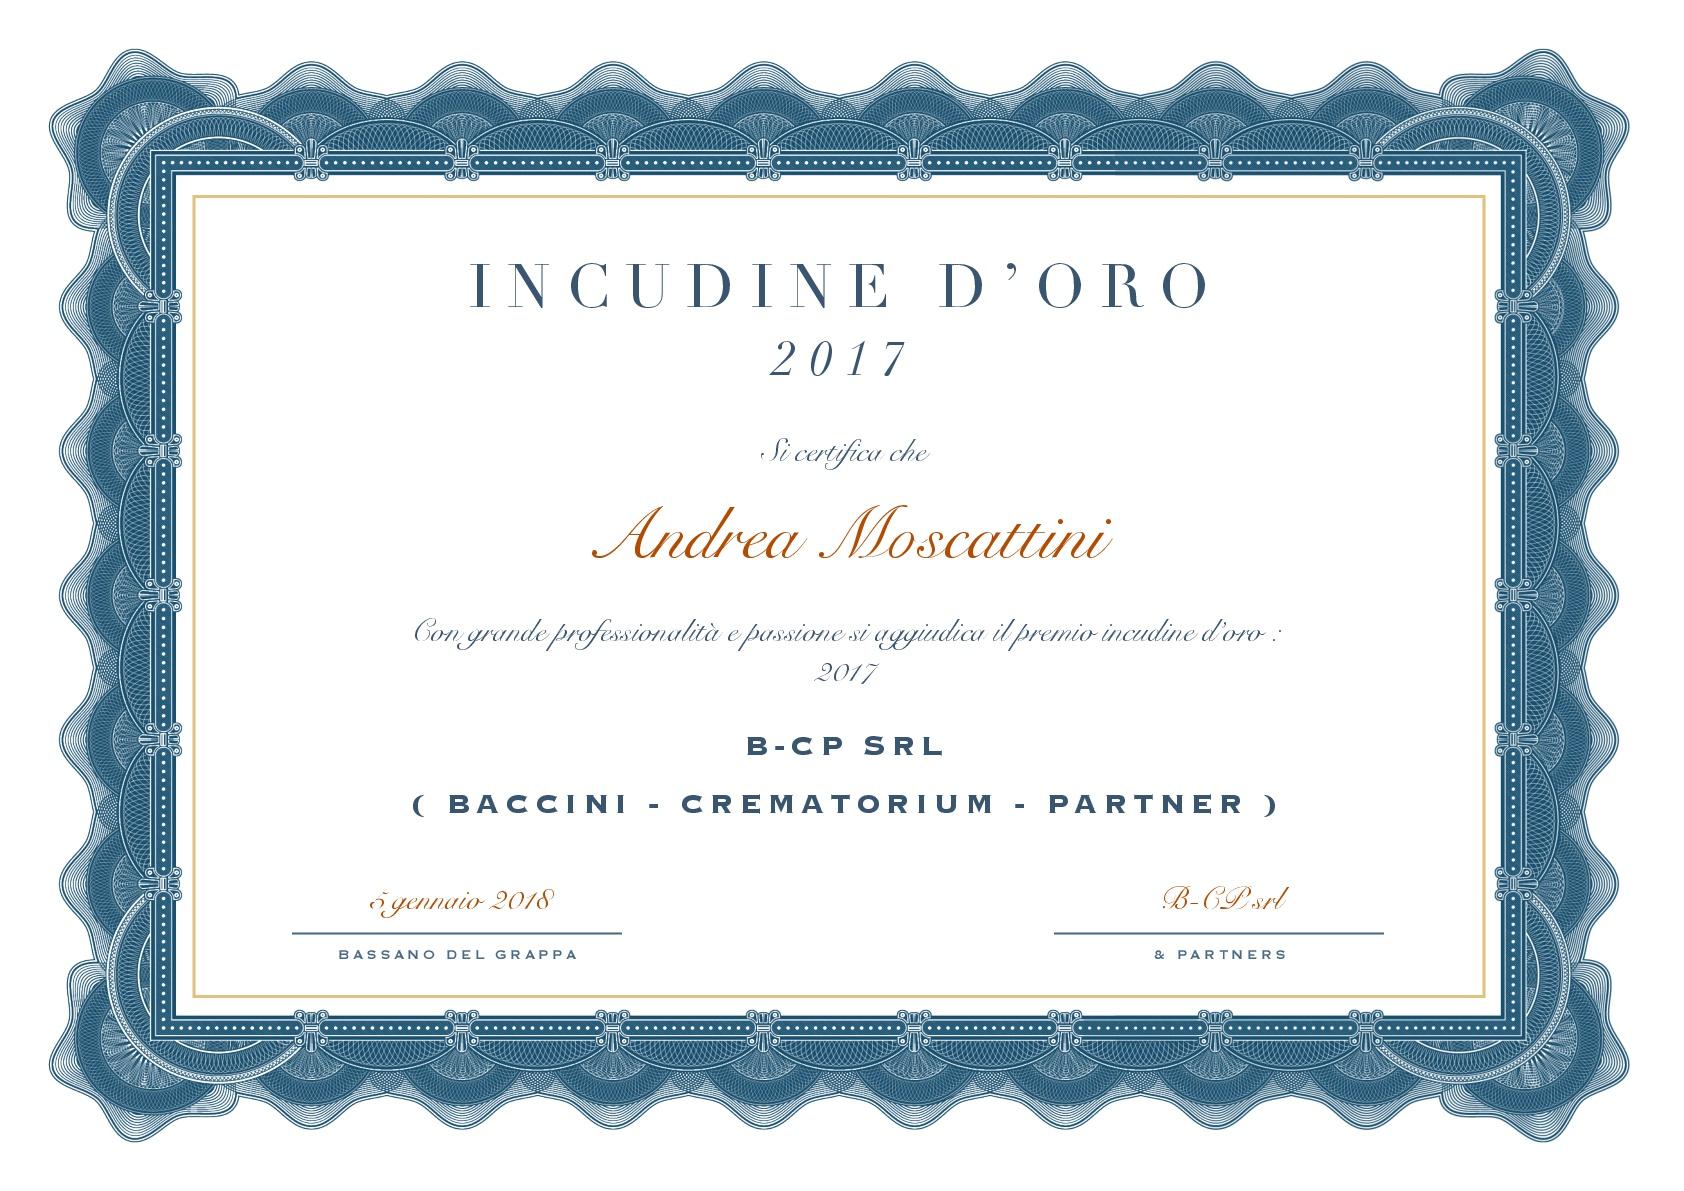 INCUDINE D'ORO 2017-001.jpg